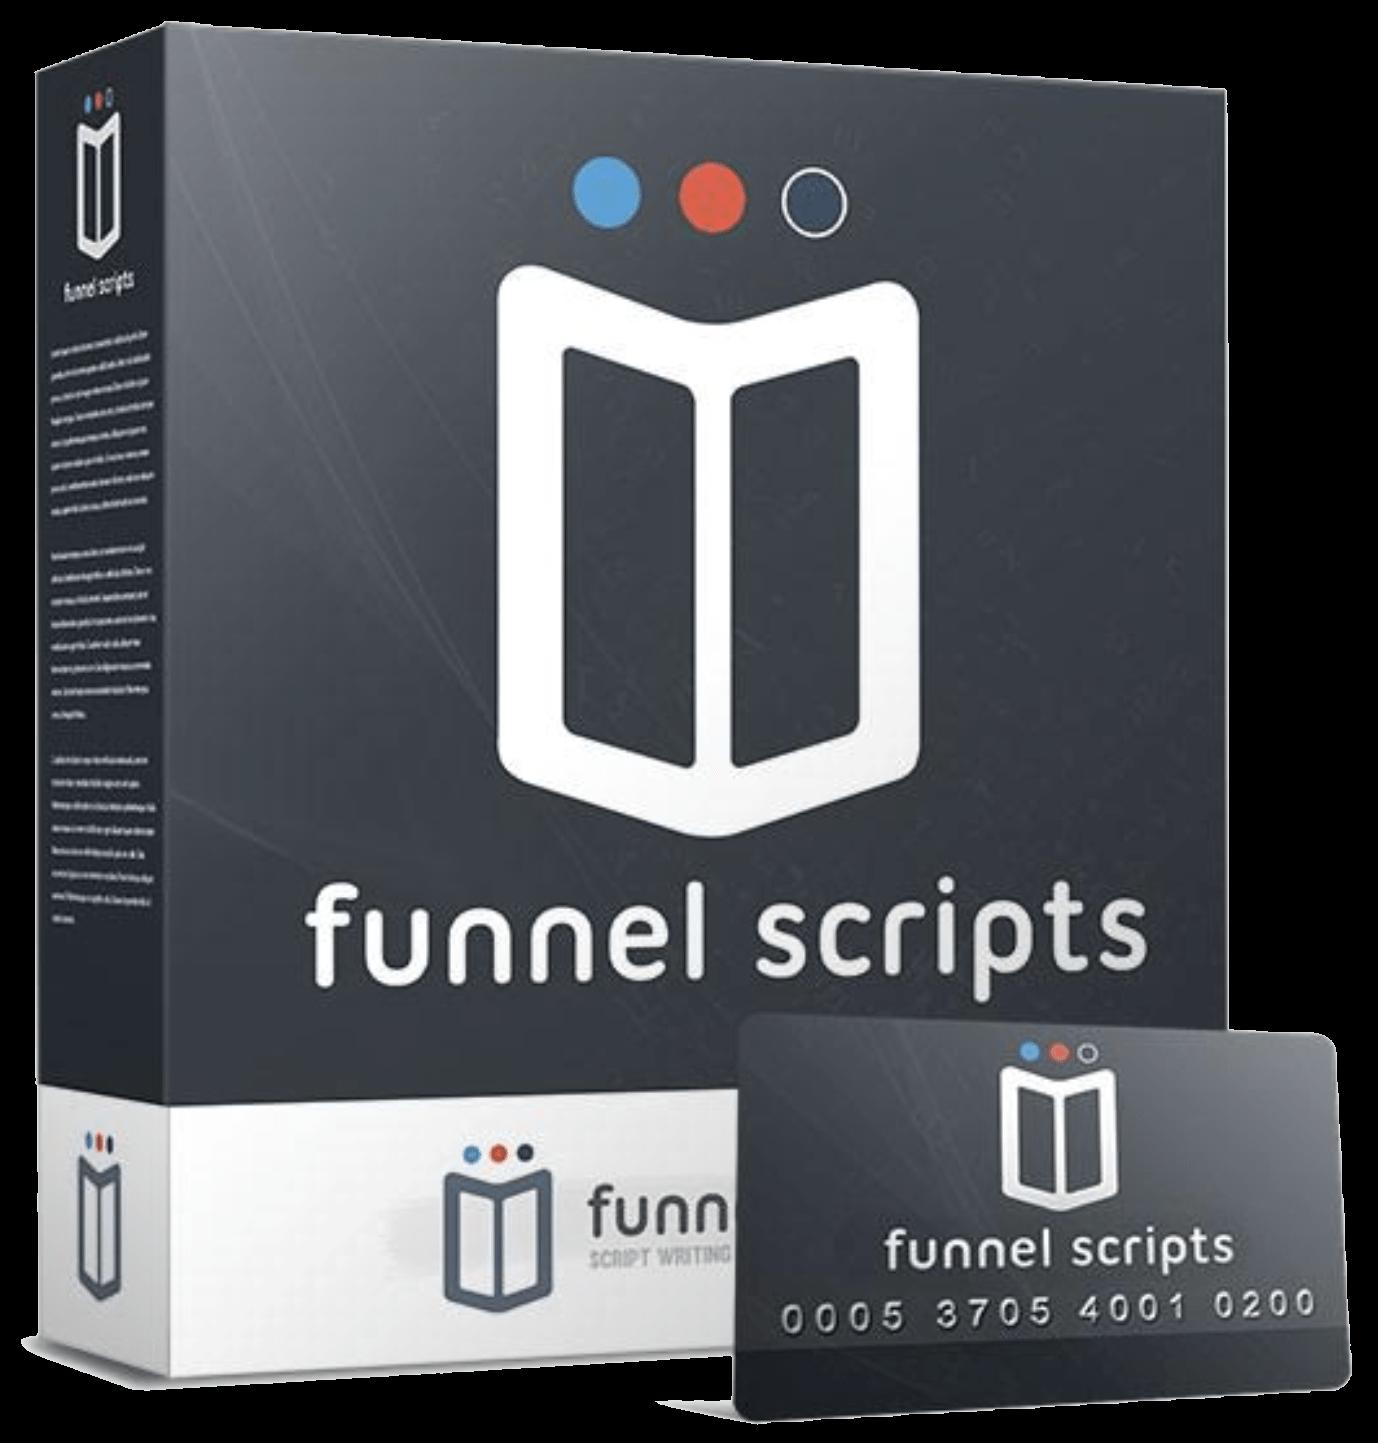 The Funnel Script Package commercial bundle software